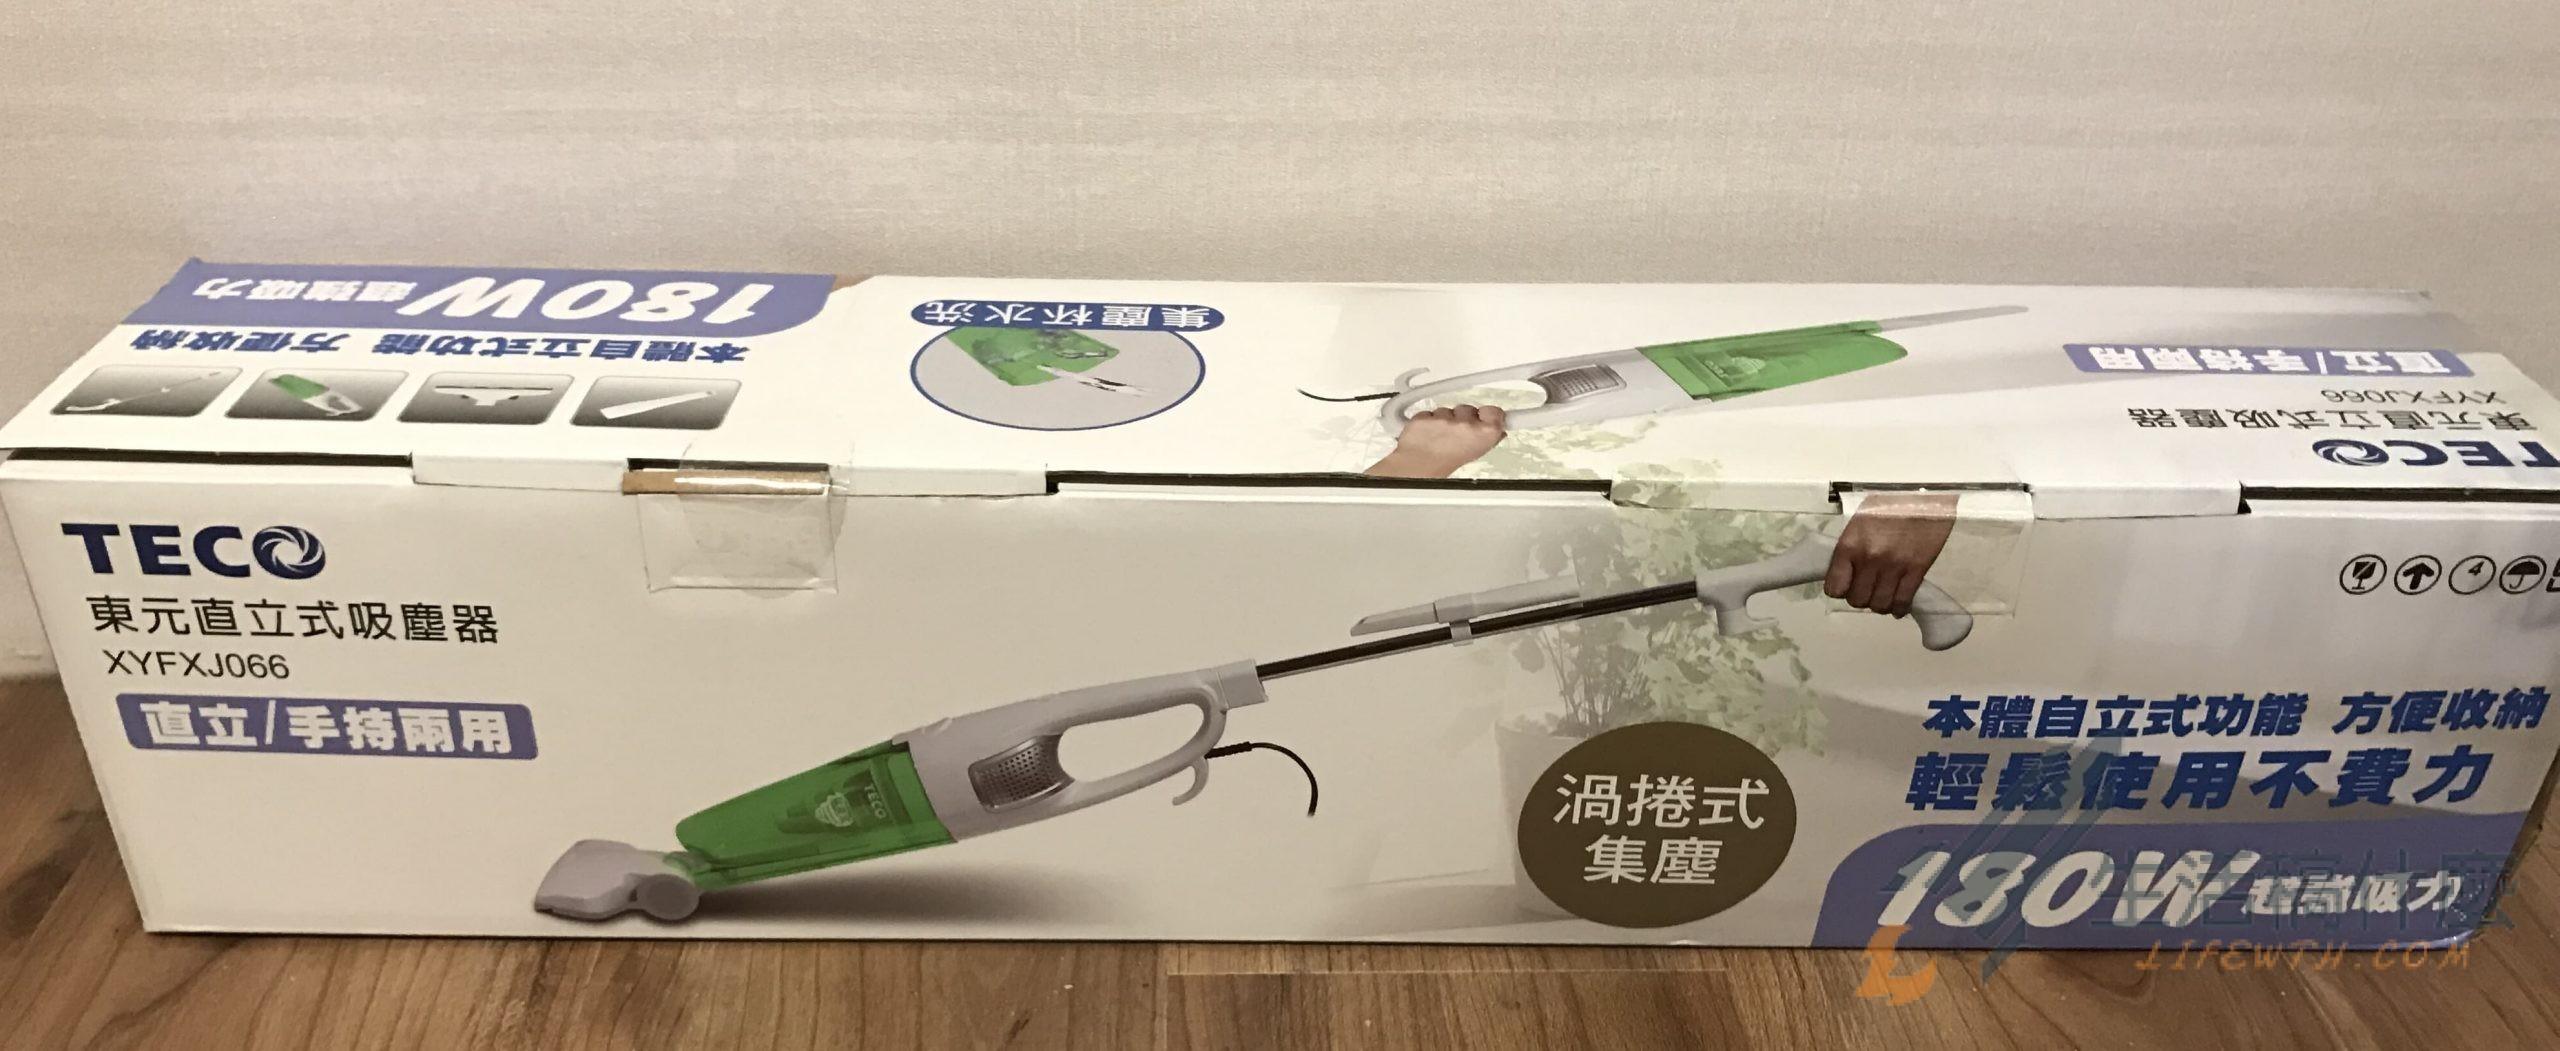 TECO東元直立式吸塵器 | 小資族必備平價手持兩用式吸塵器(吸力超強)!